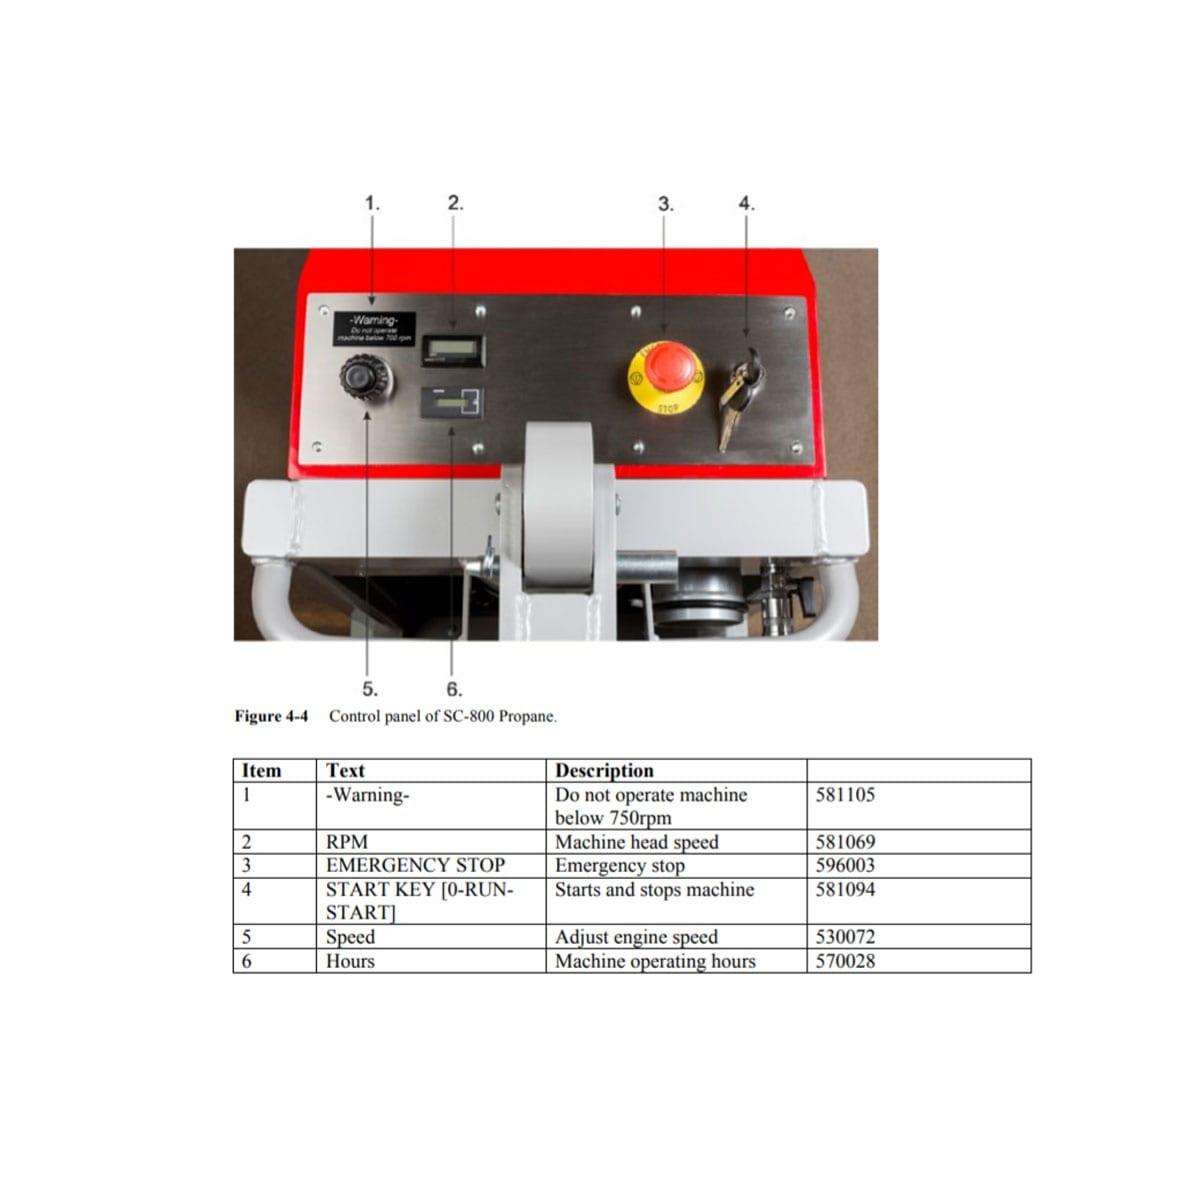 Dash Scanmaskin Combiflex 650 PROPANE SC 650 Propane Turning Point Supply